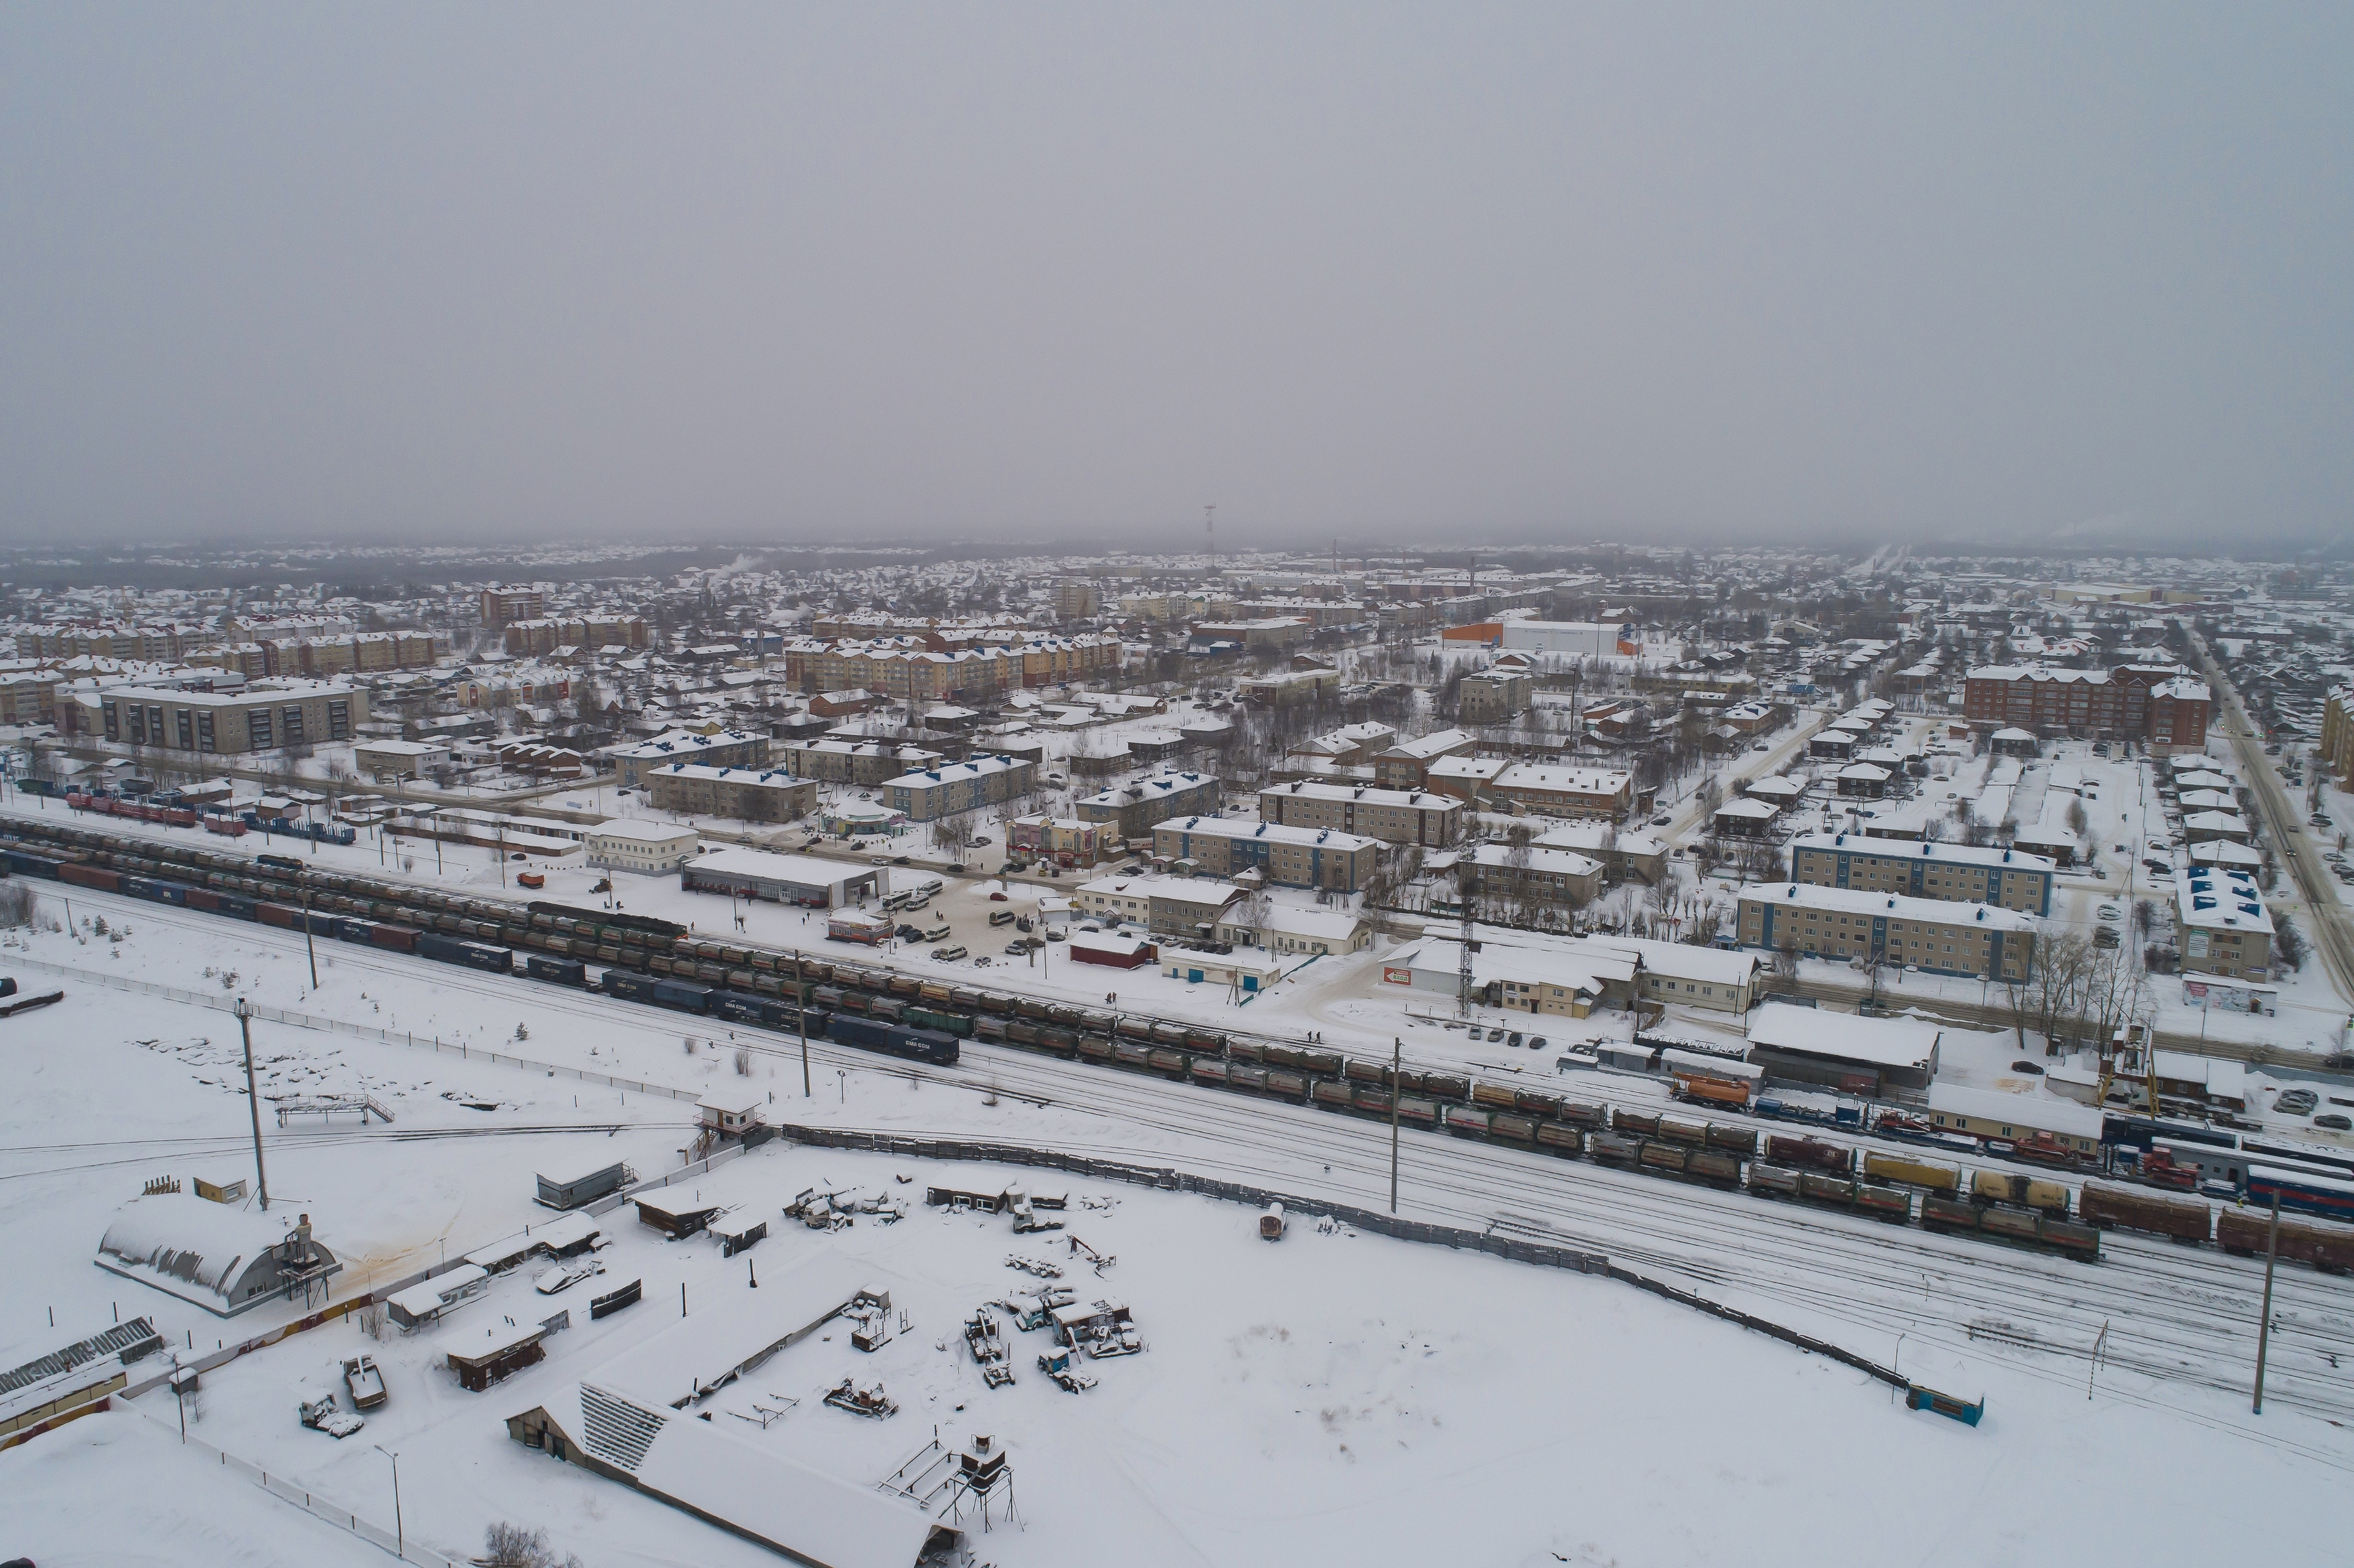 Nowosibirsk, Oblast Nowosibirsk, Russland